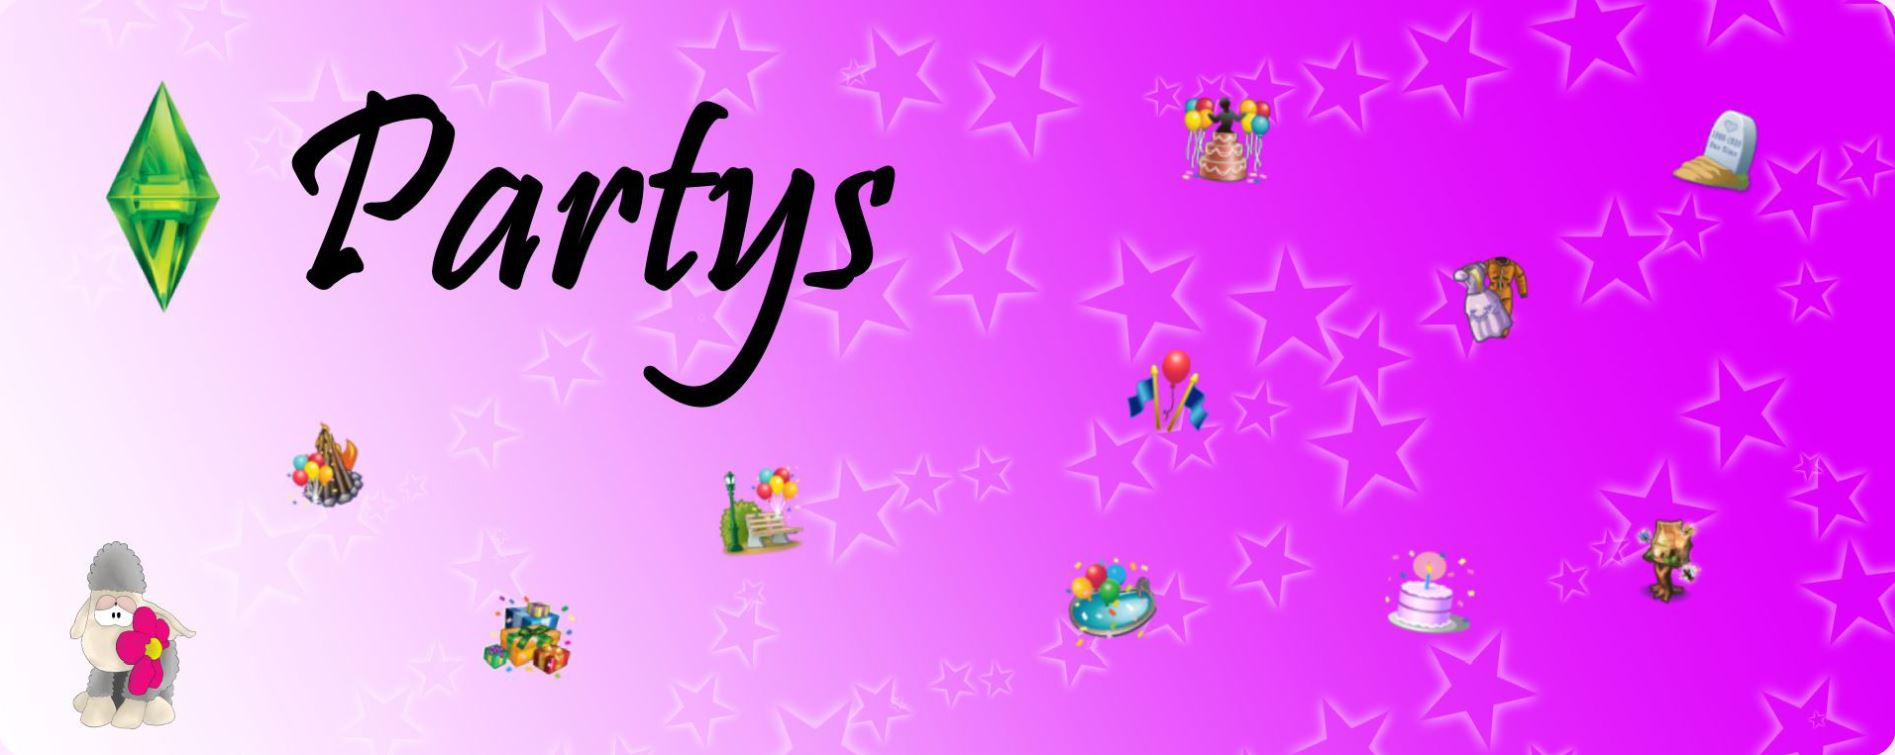 Partys - saphrina-simss Webseite!